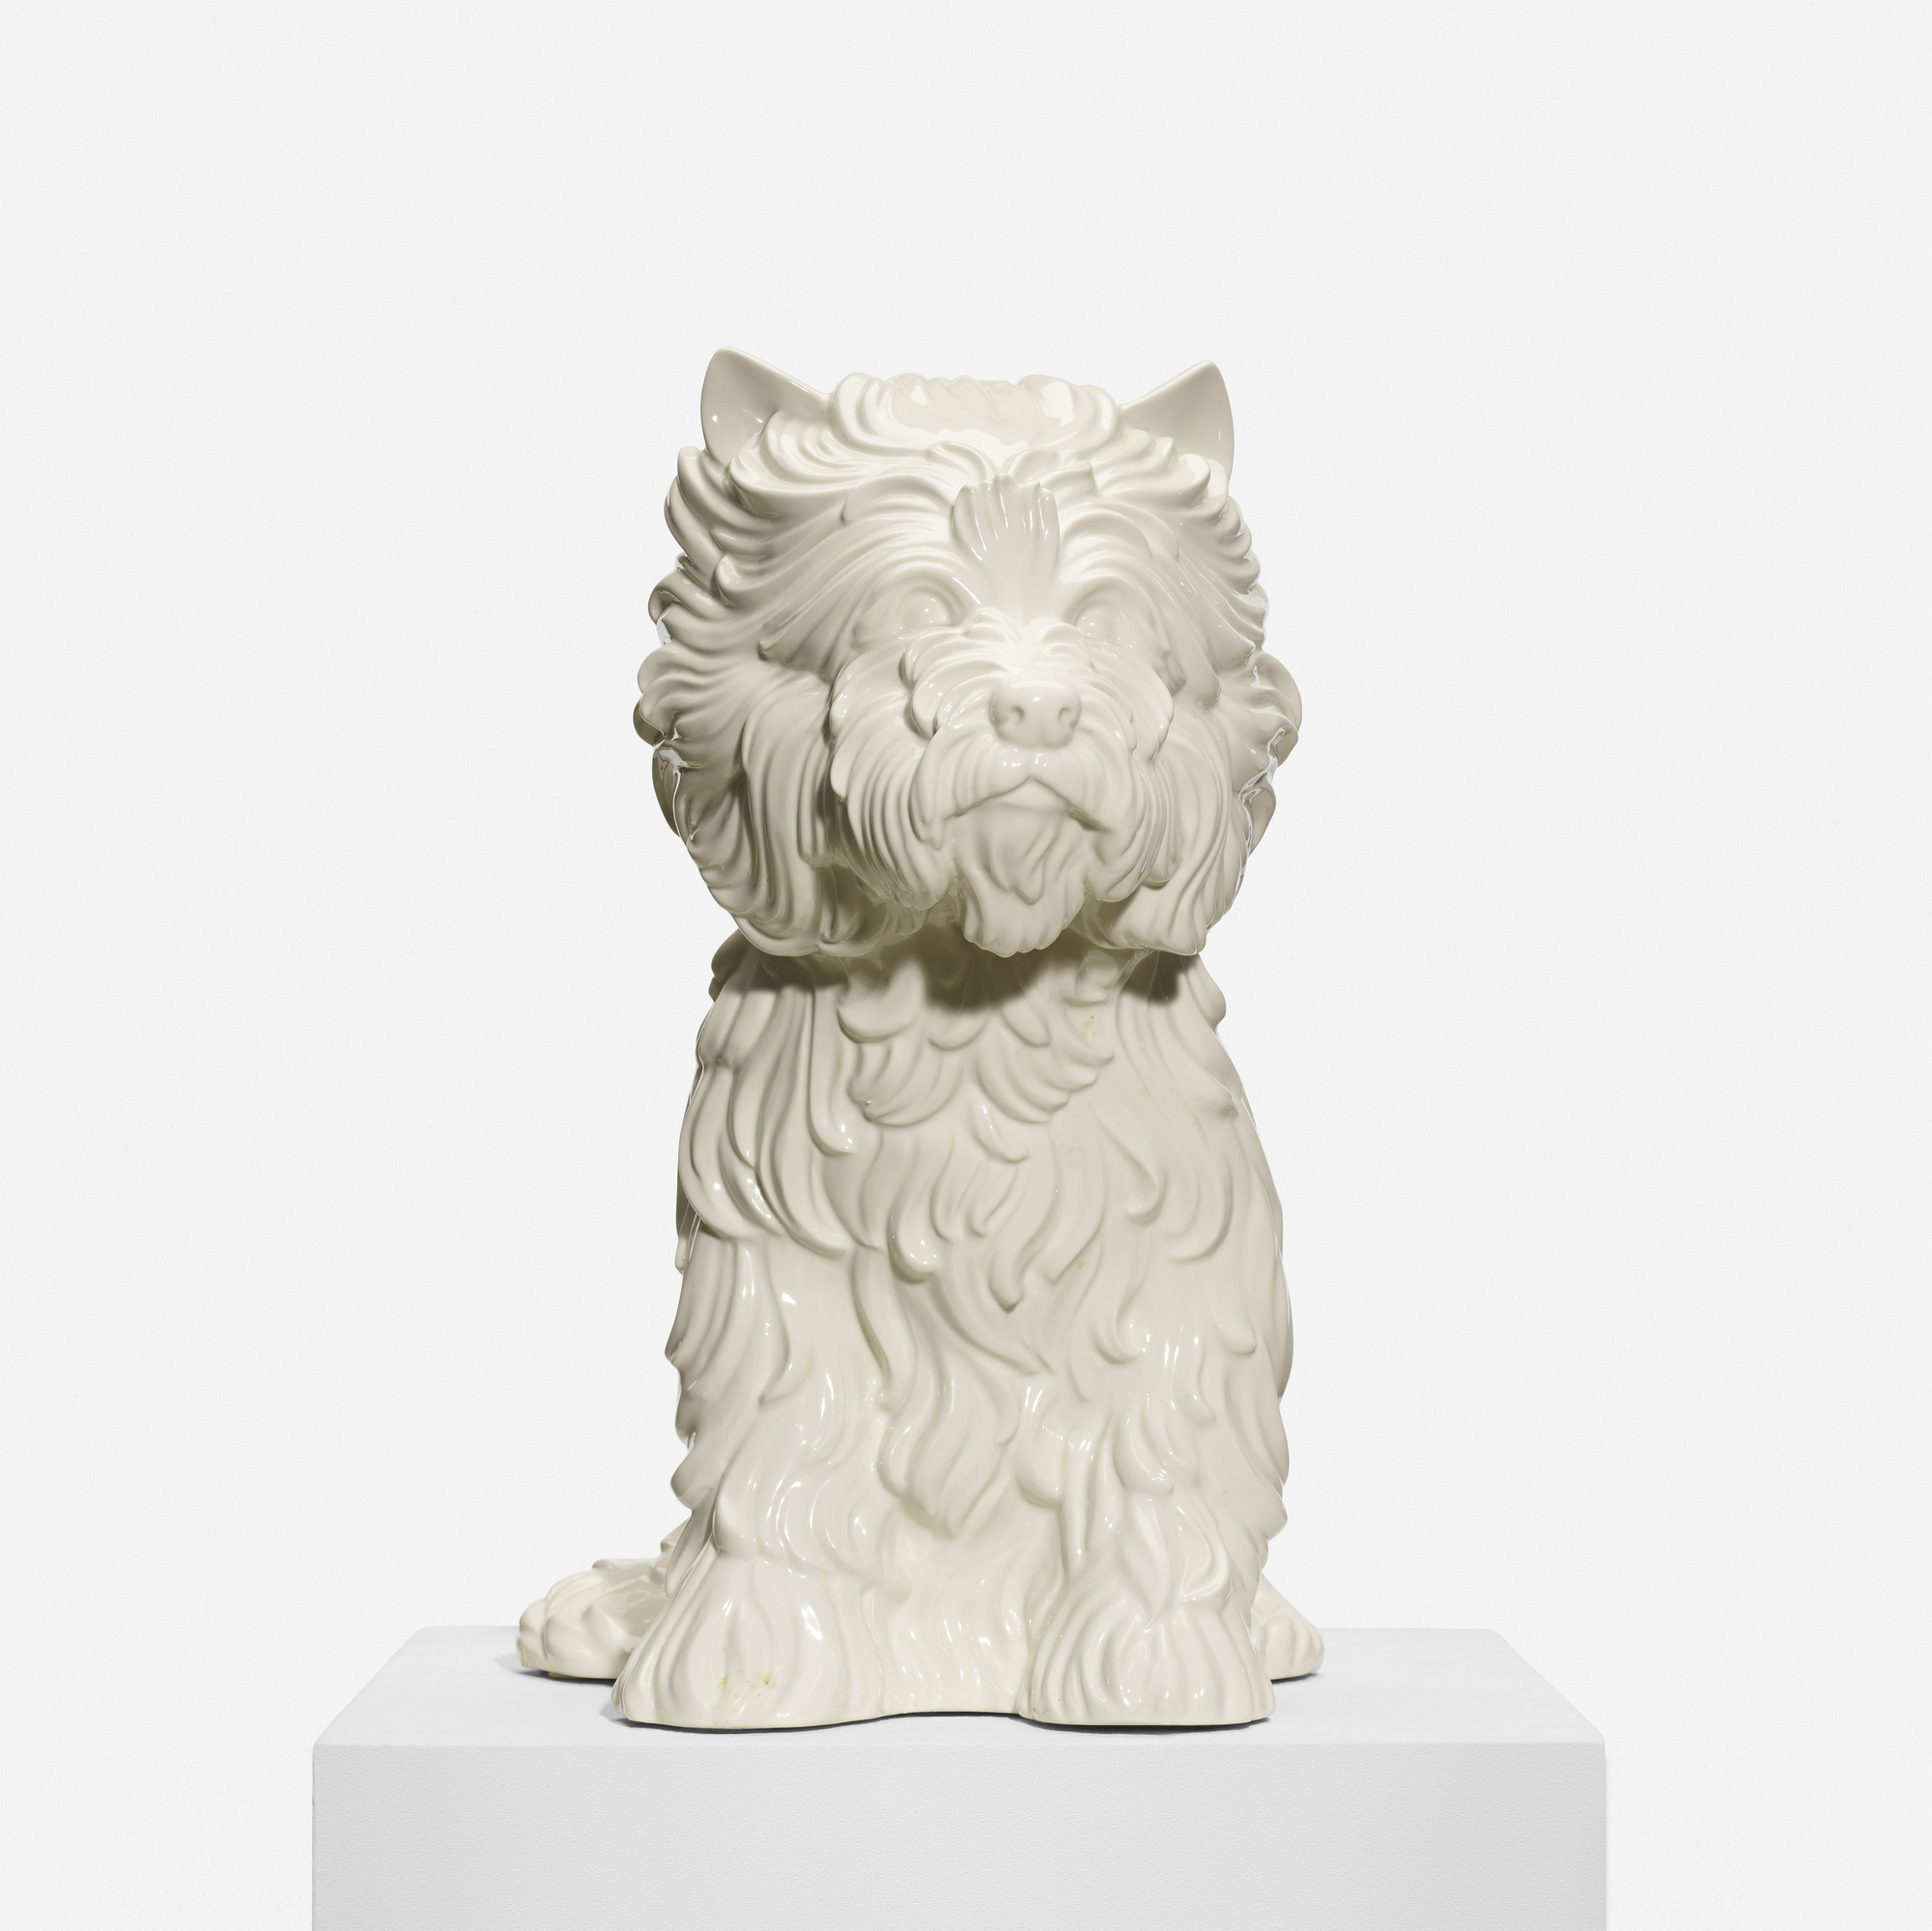 228: Jeff Koons / Puppy (vase) (1 of 3)